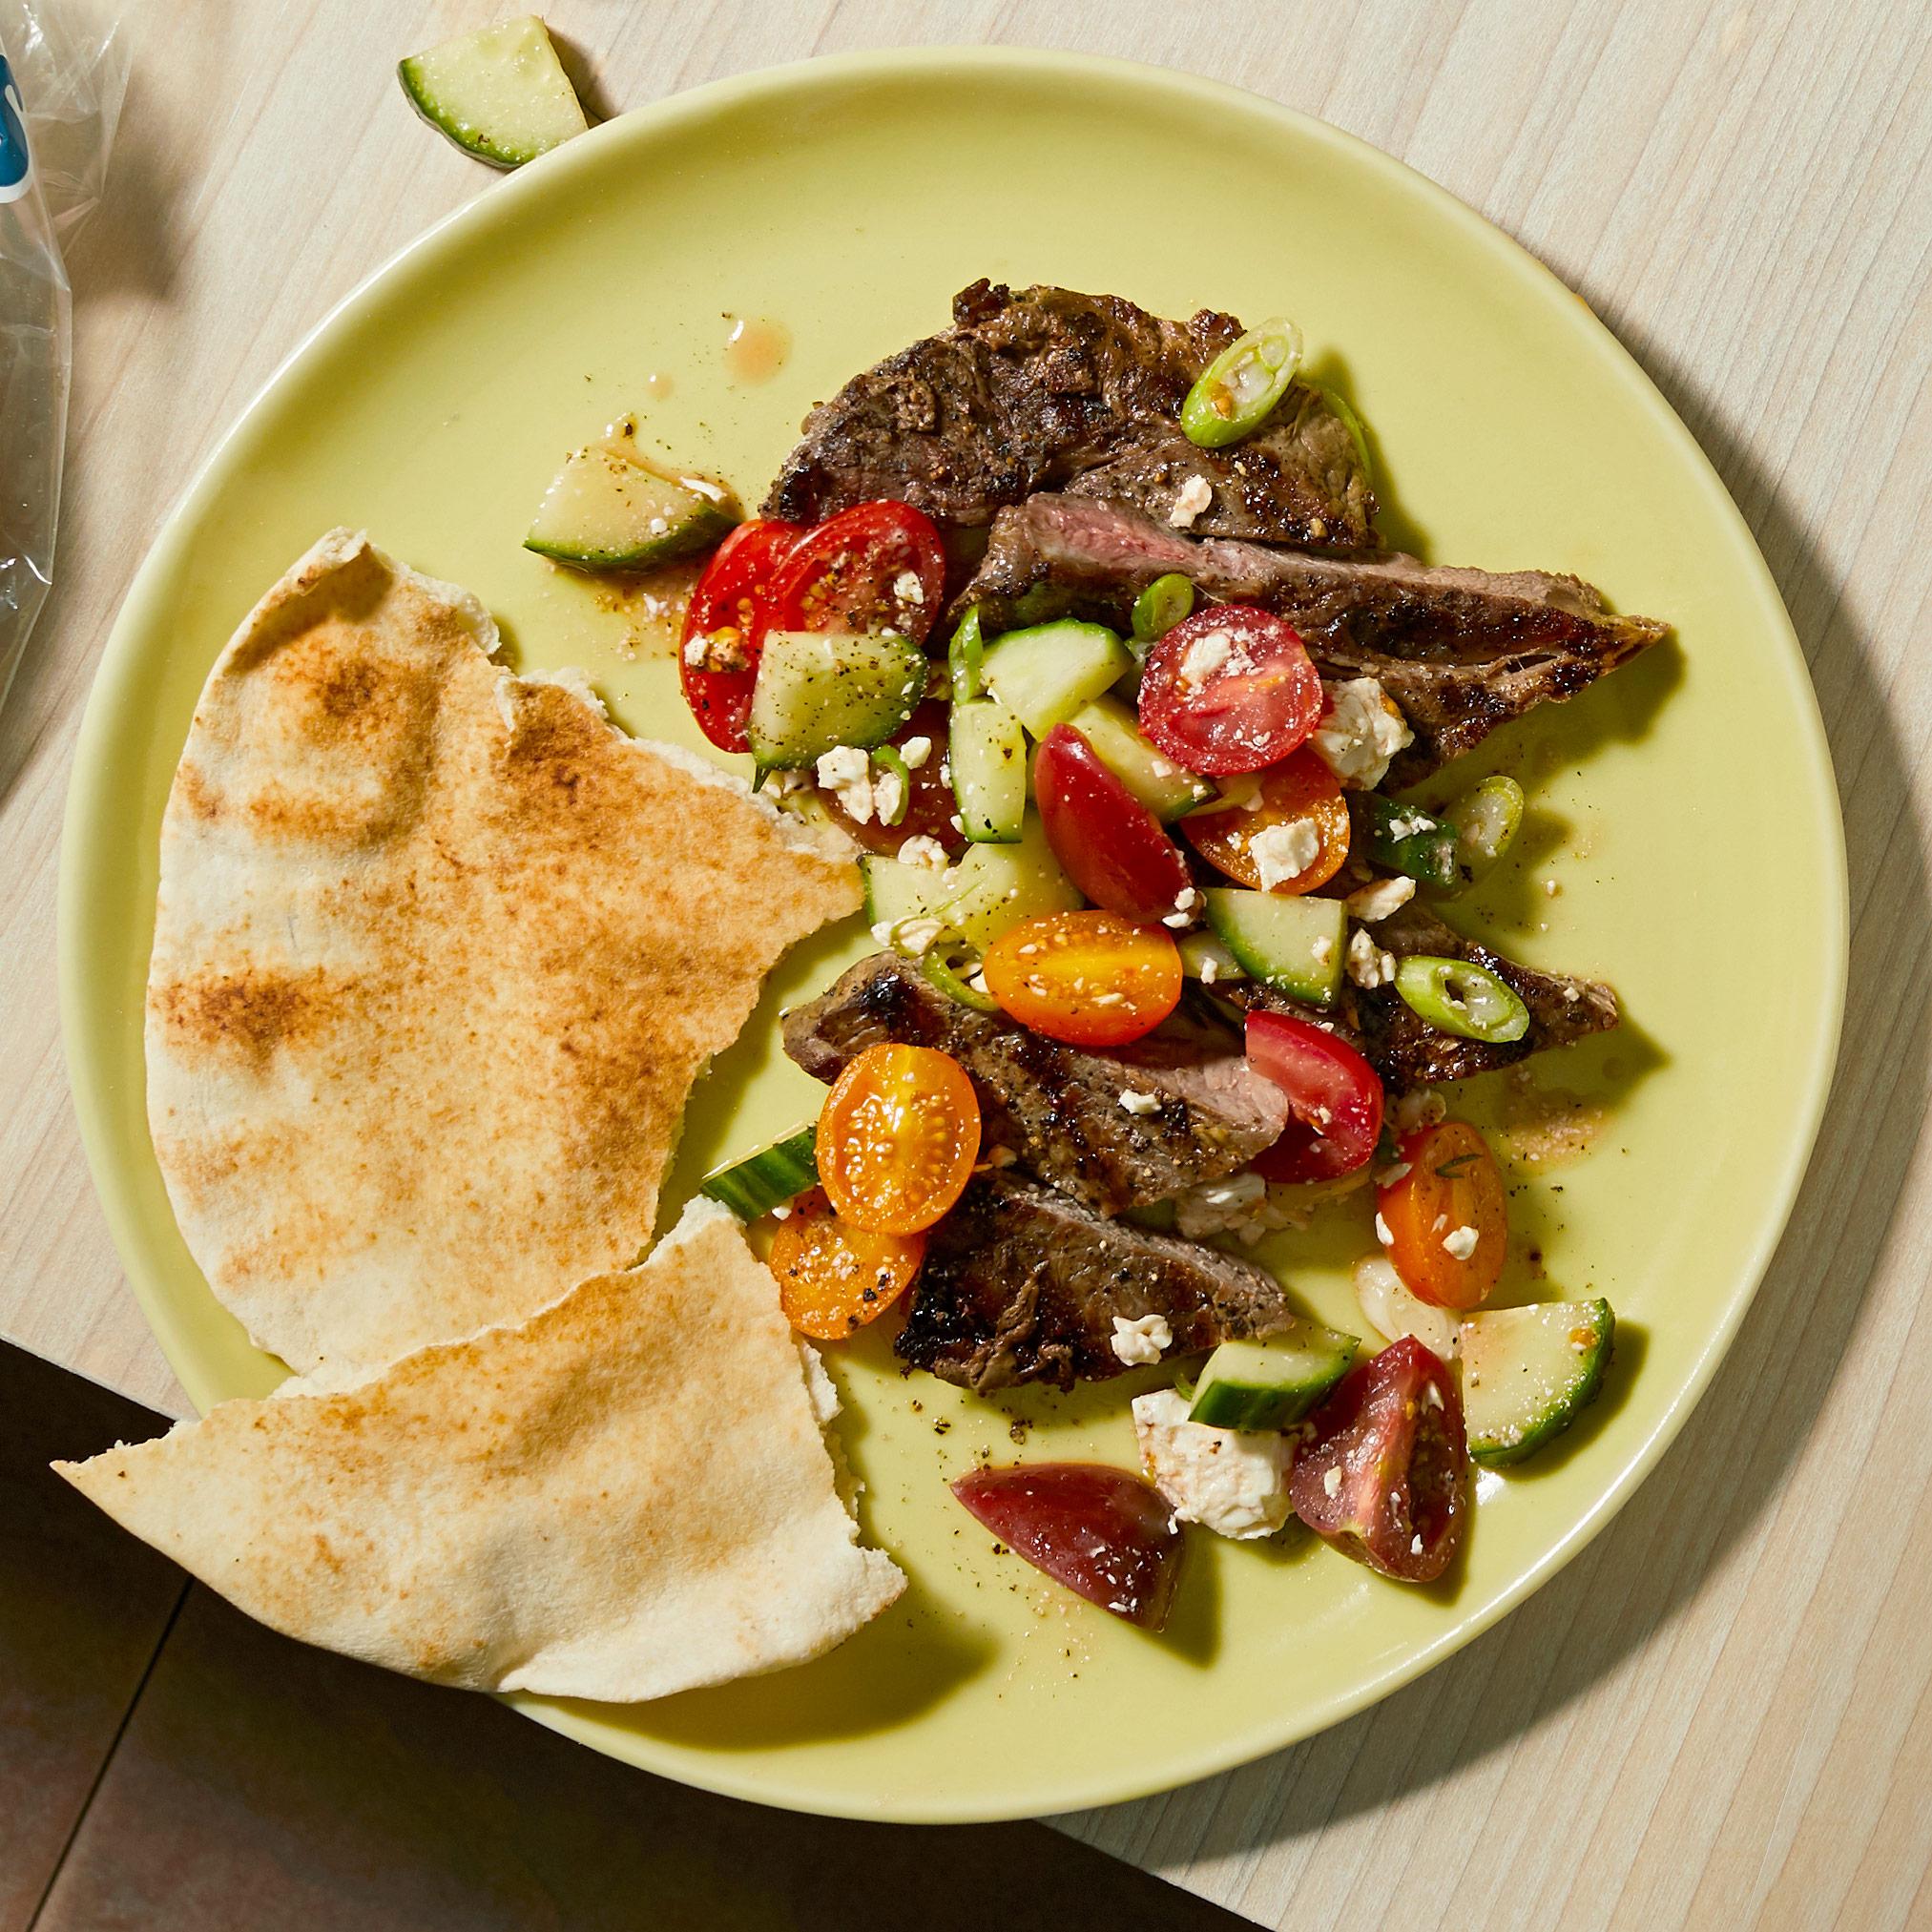 Greek Steak and Salad